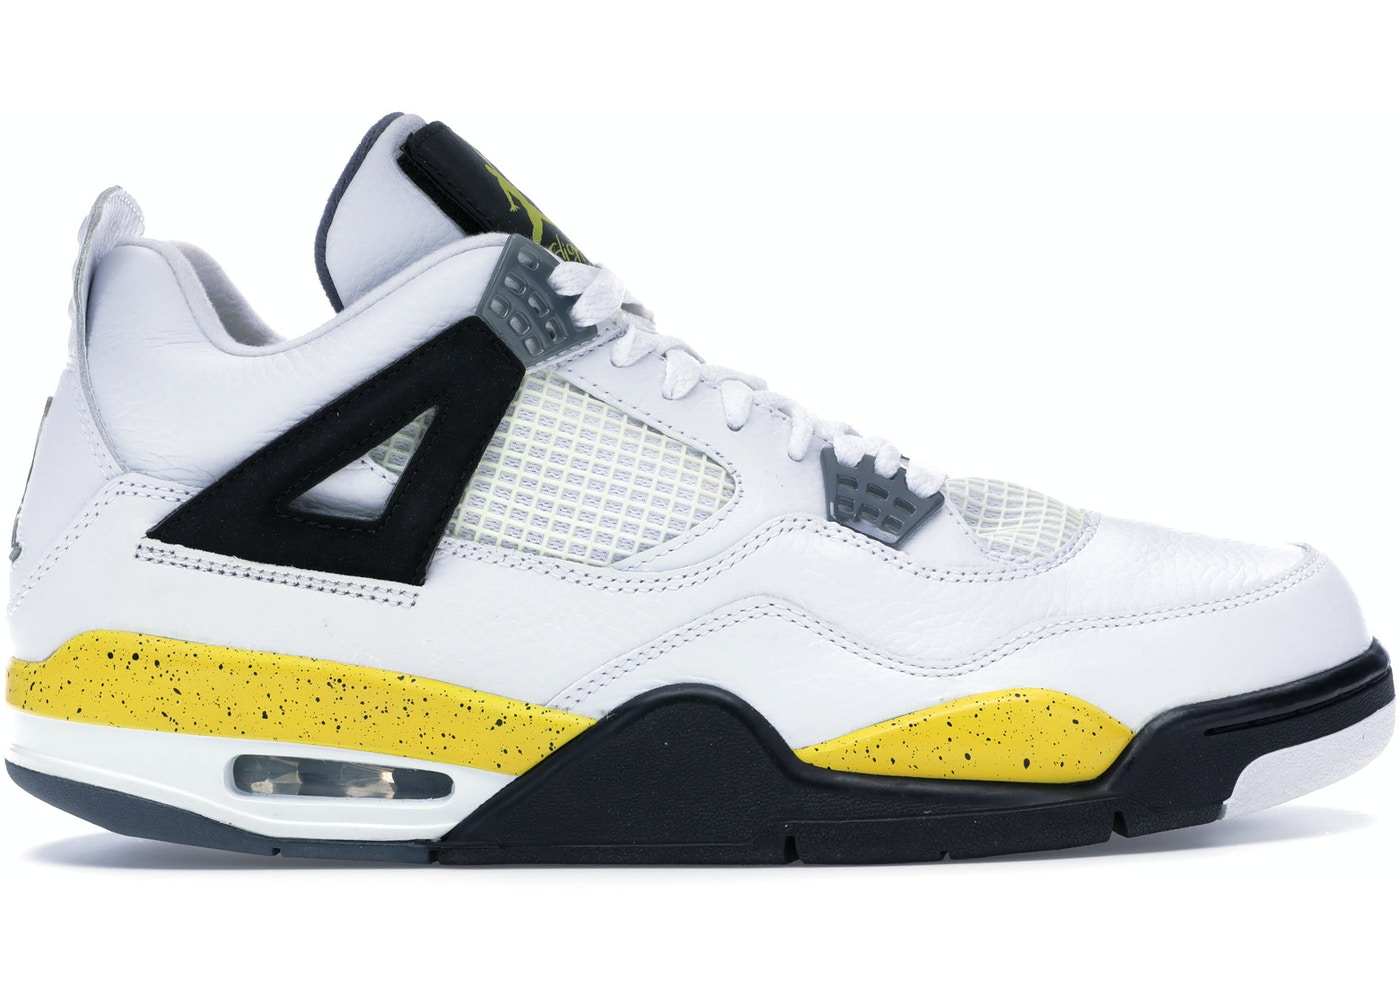 4ebdad711f75 Jordan 4 Retro Tour Yellow   Rare Air - 314254-171